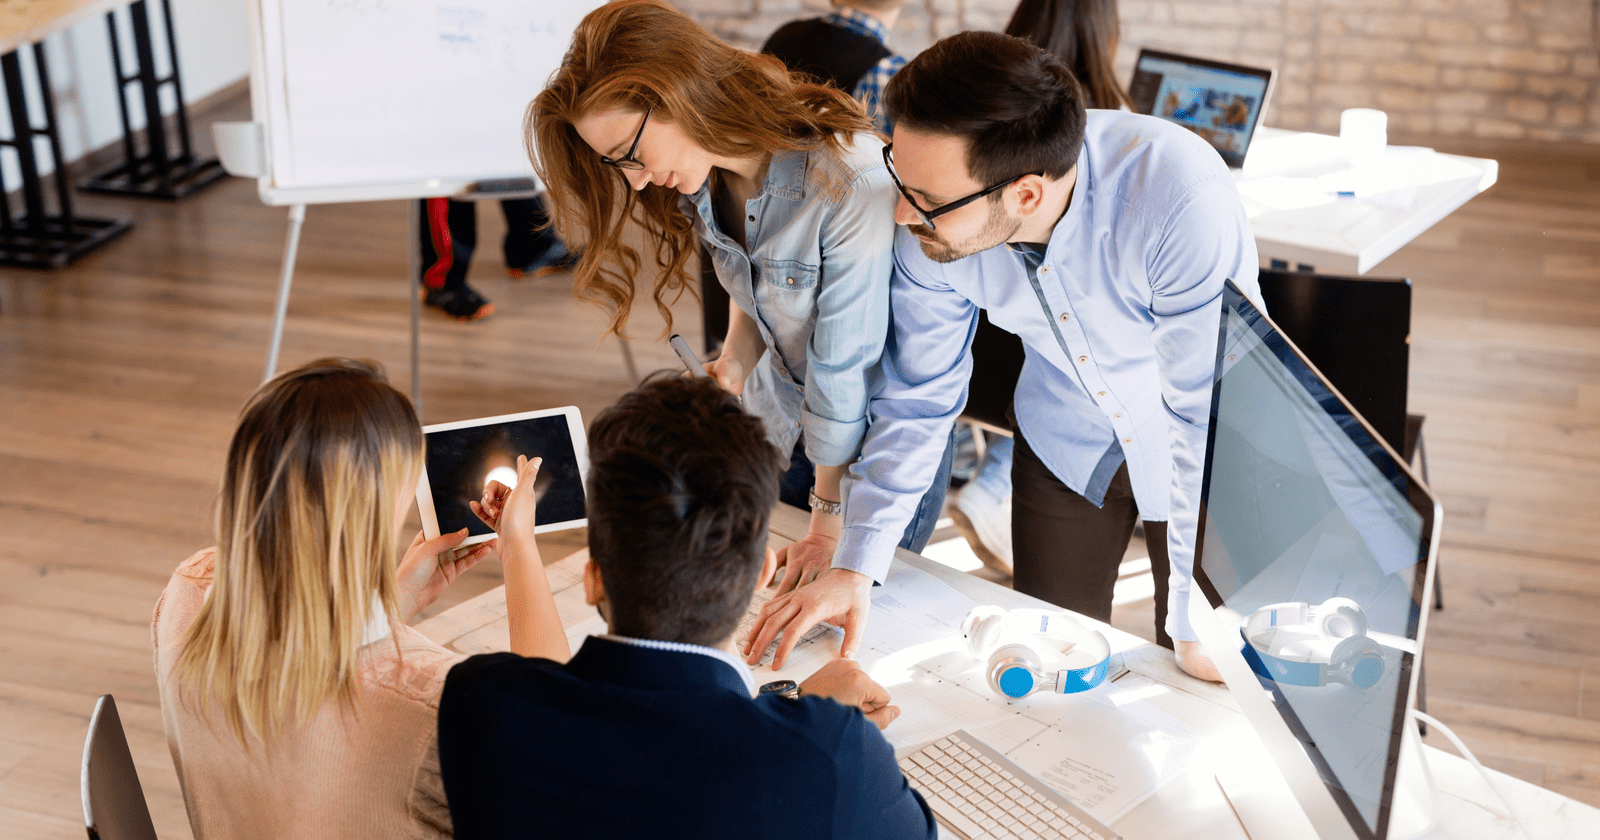 Vindicta-Digital-Top-SEO-Digital-Marketing-Agency